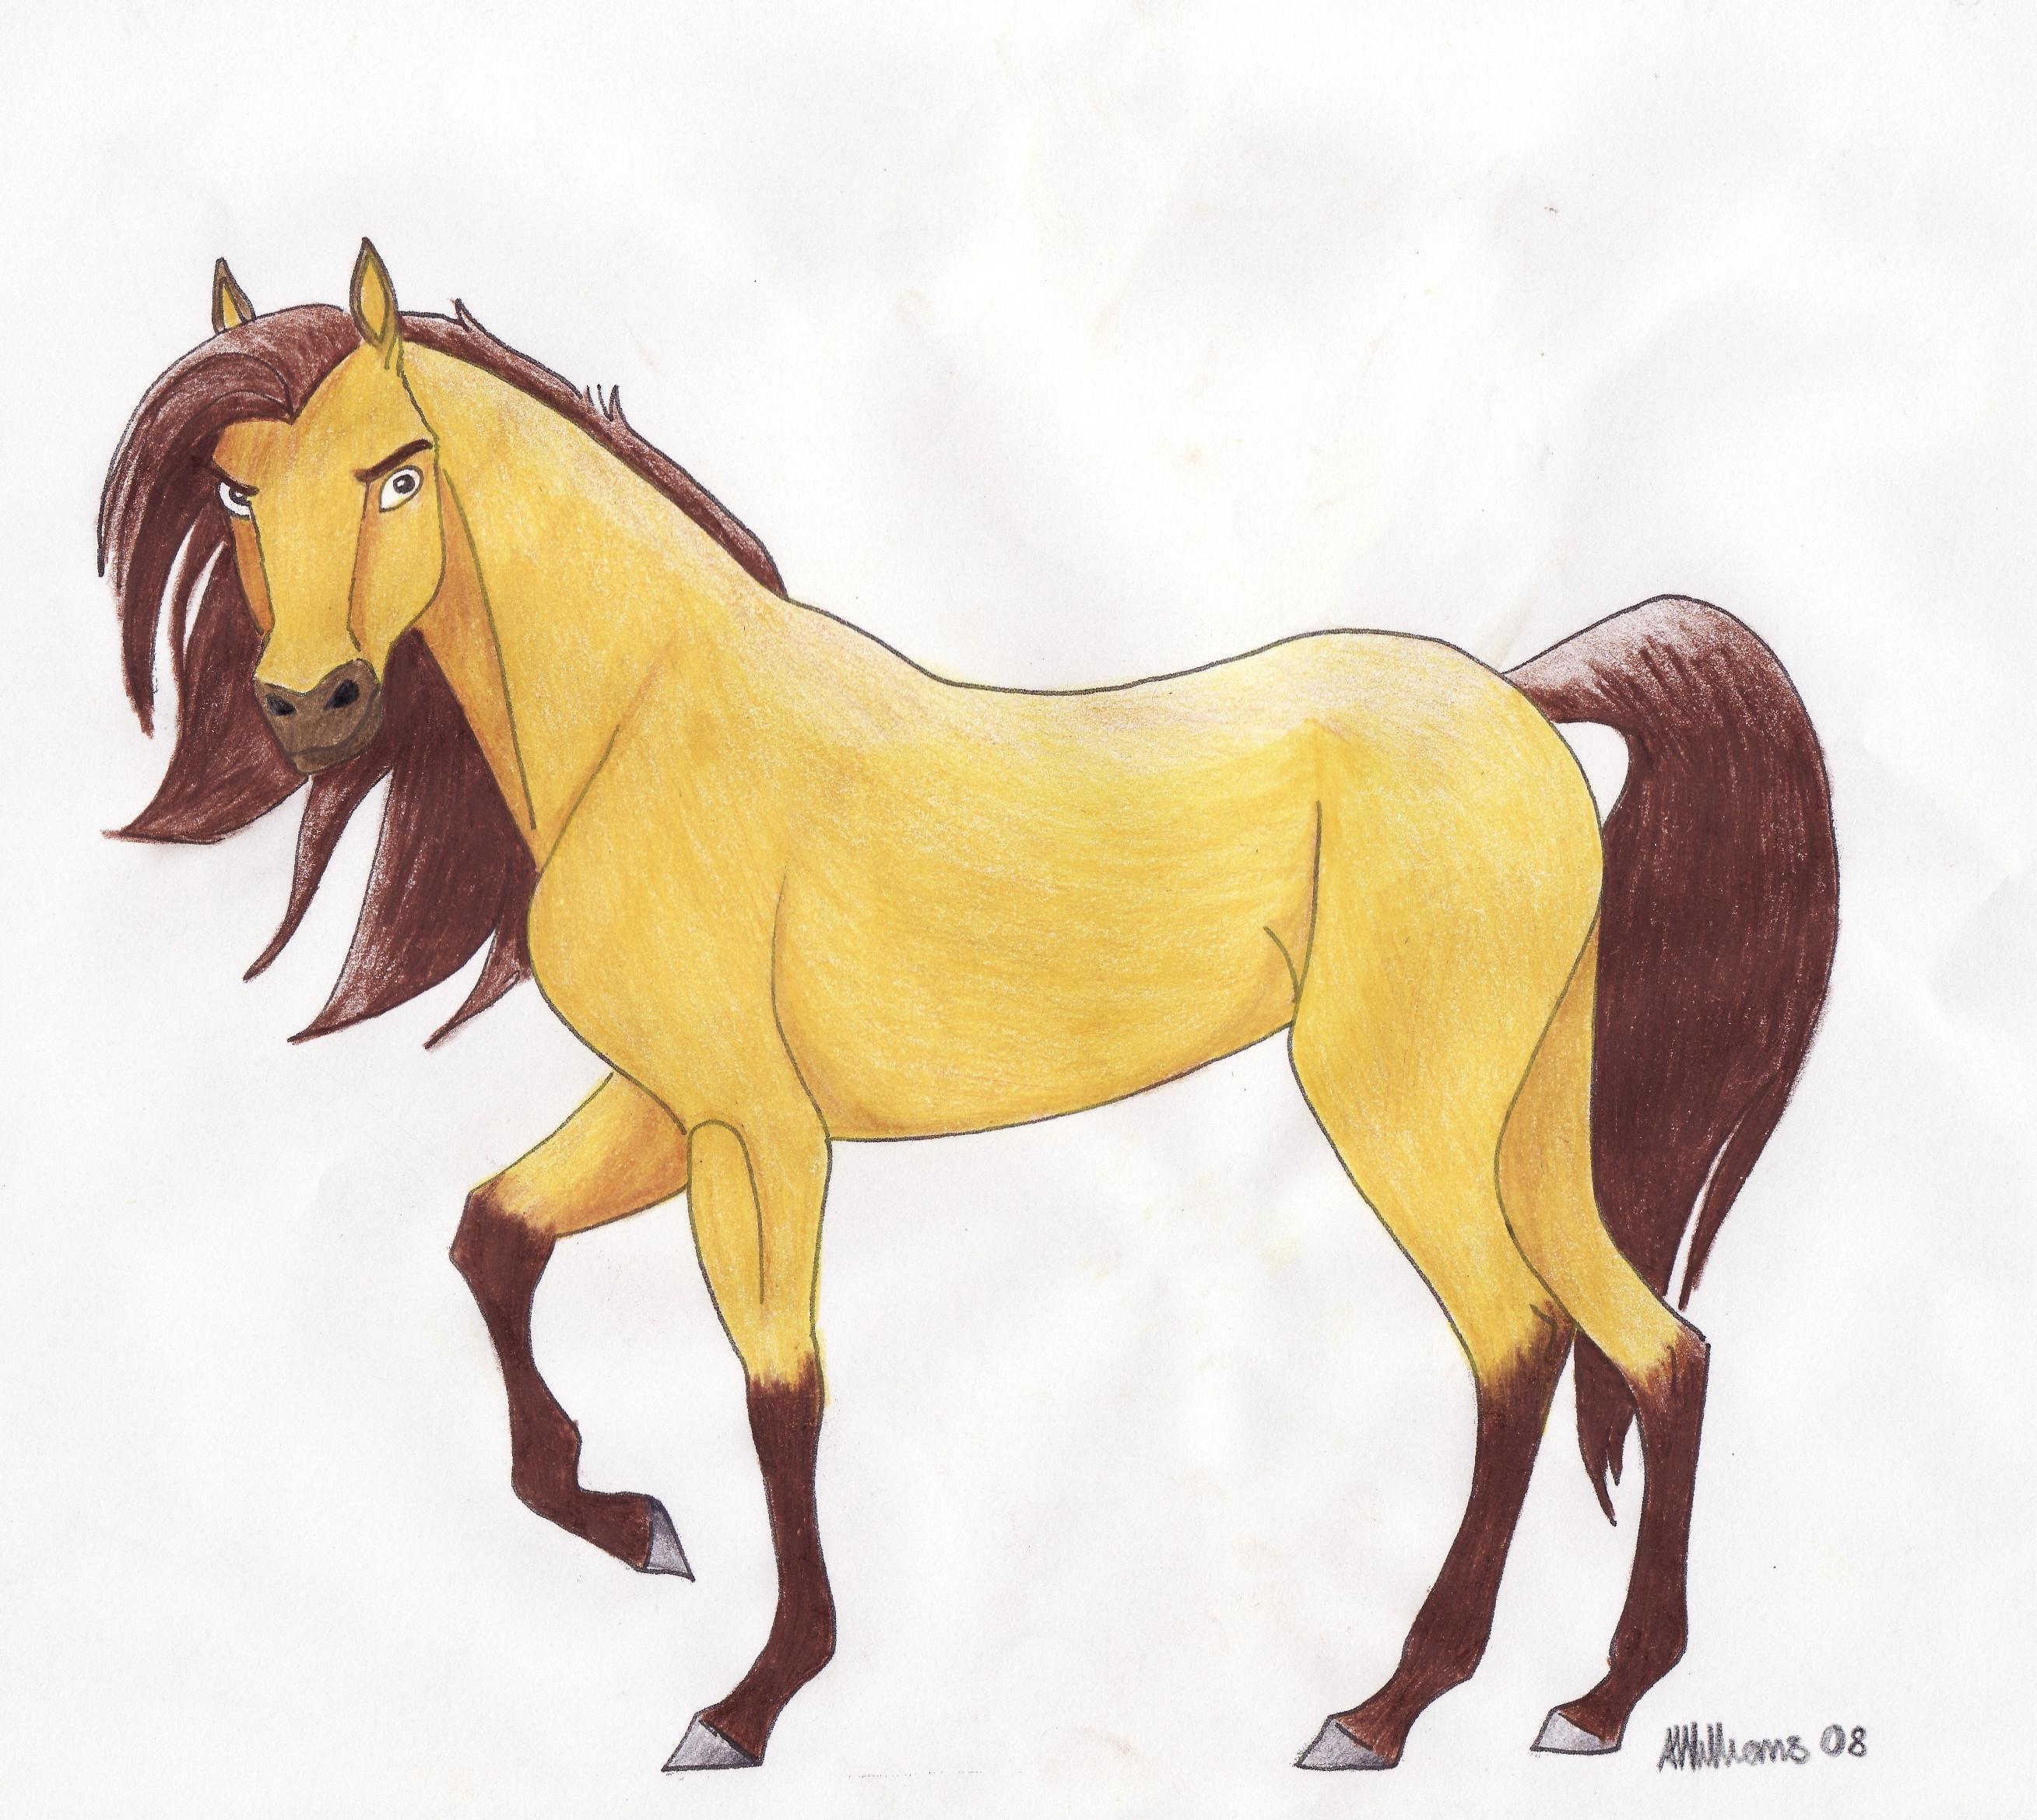 2617x2338 Pencil Drawings Of Mustangs Horses Best Horse Drawings Ideas